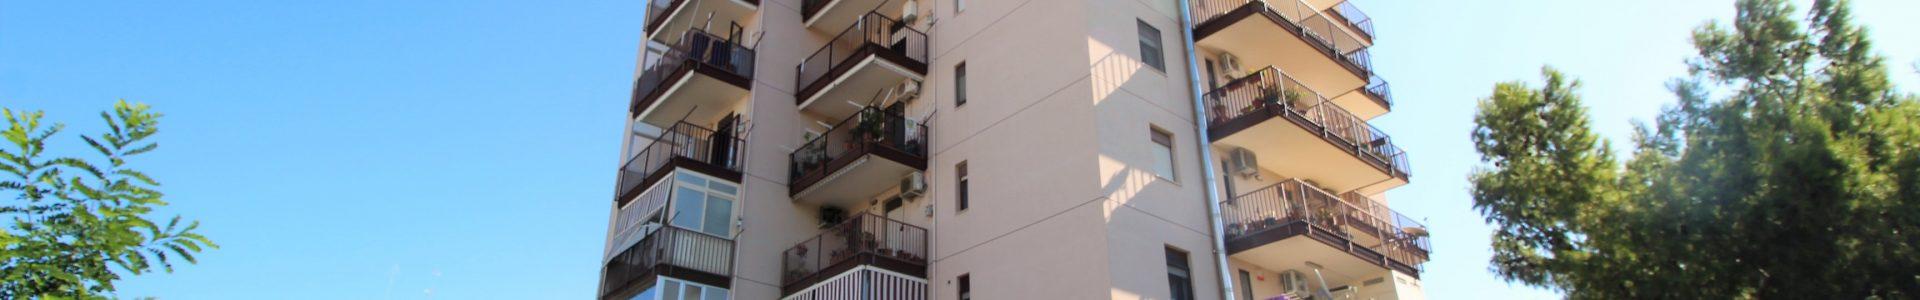 Bari , Japigia – ampio 5 vani con posto auto e cantina